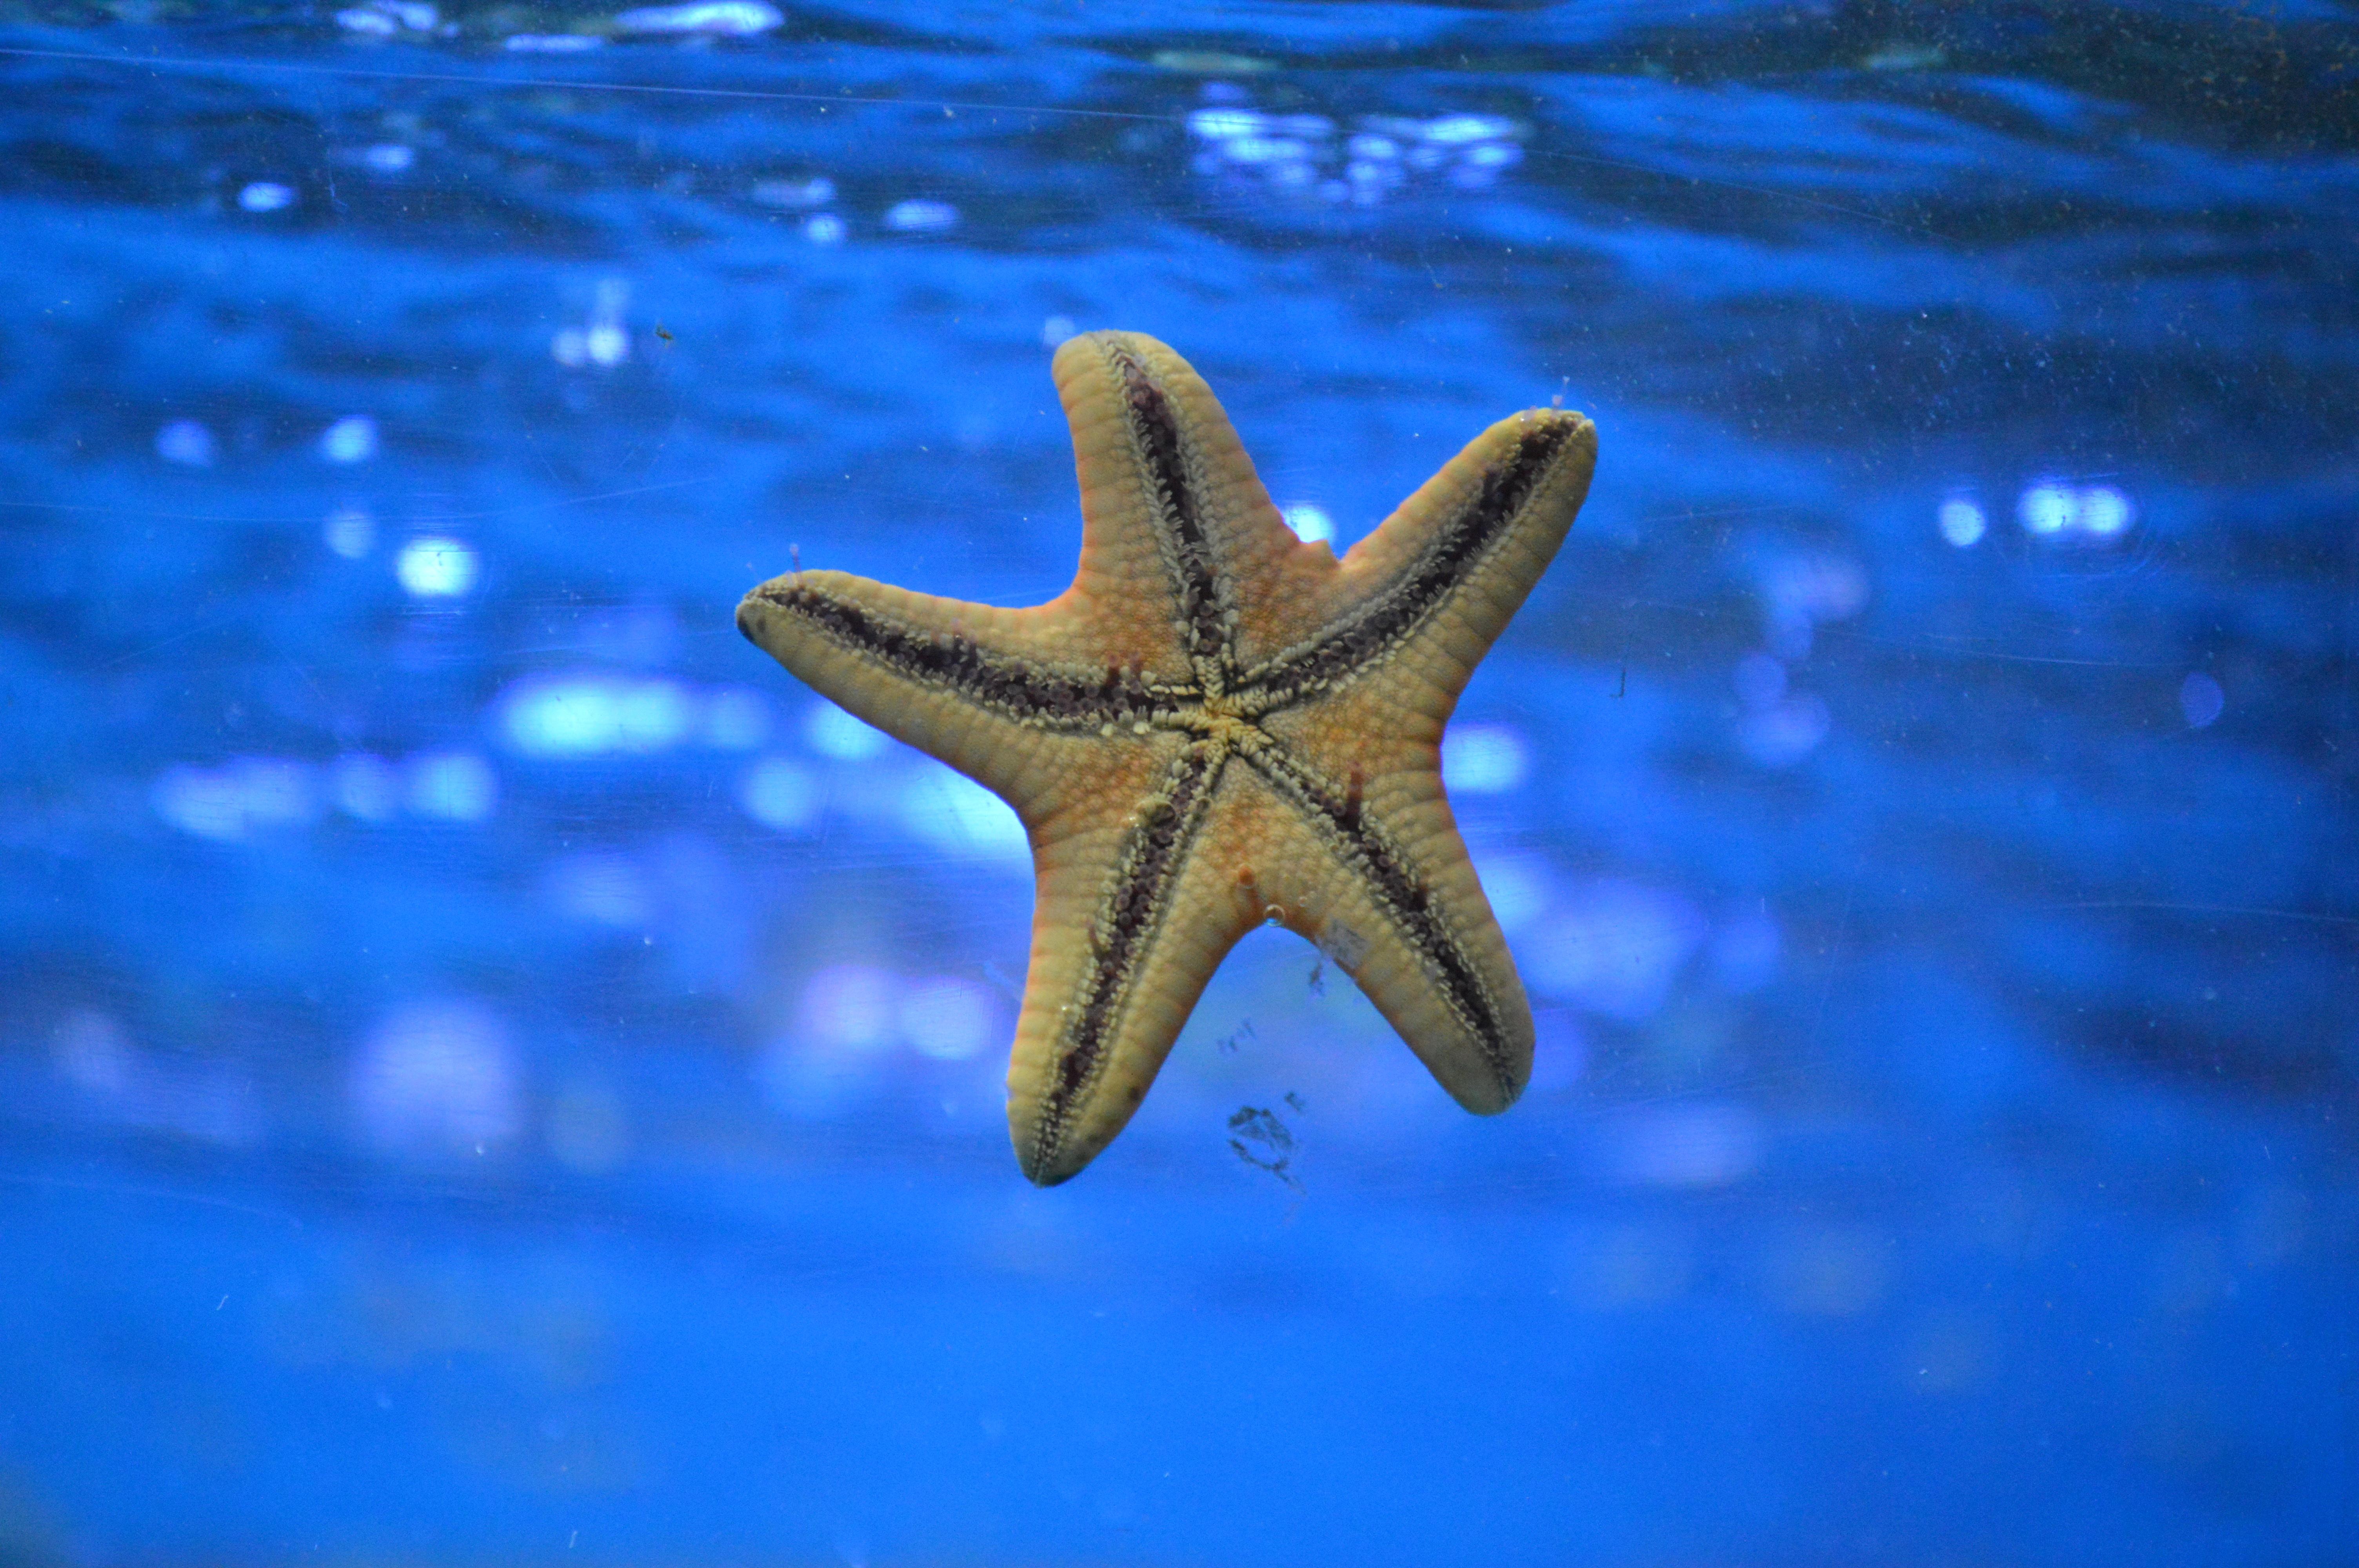 141739 download wallpaper Nature, Starfish, Underwater World, To Swim, Swim screensavers and pictures for free